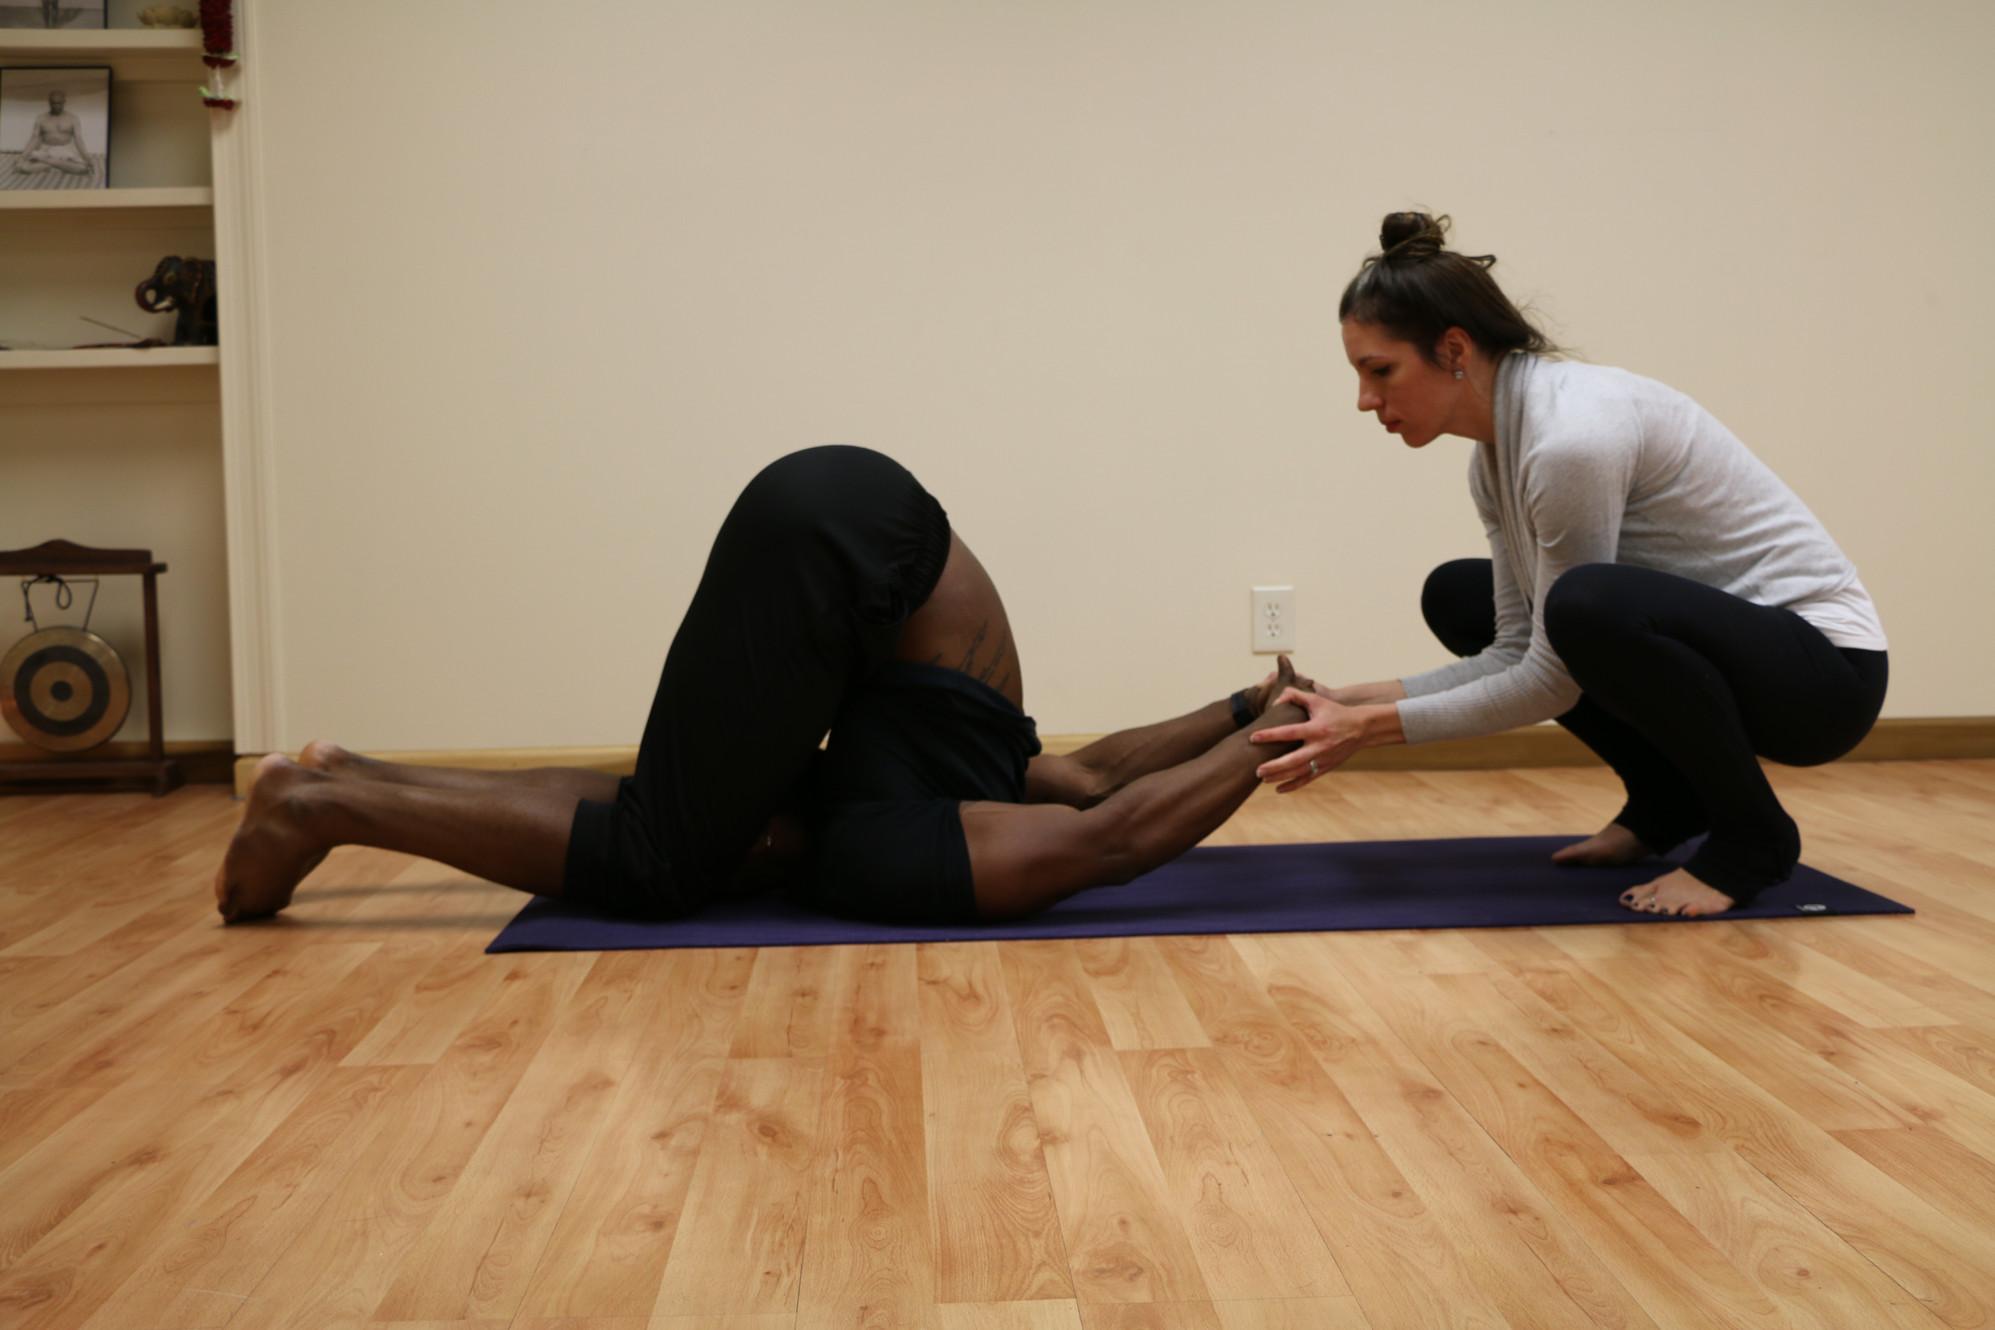 Why I No Longer Teach Vinyasa Yoga